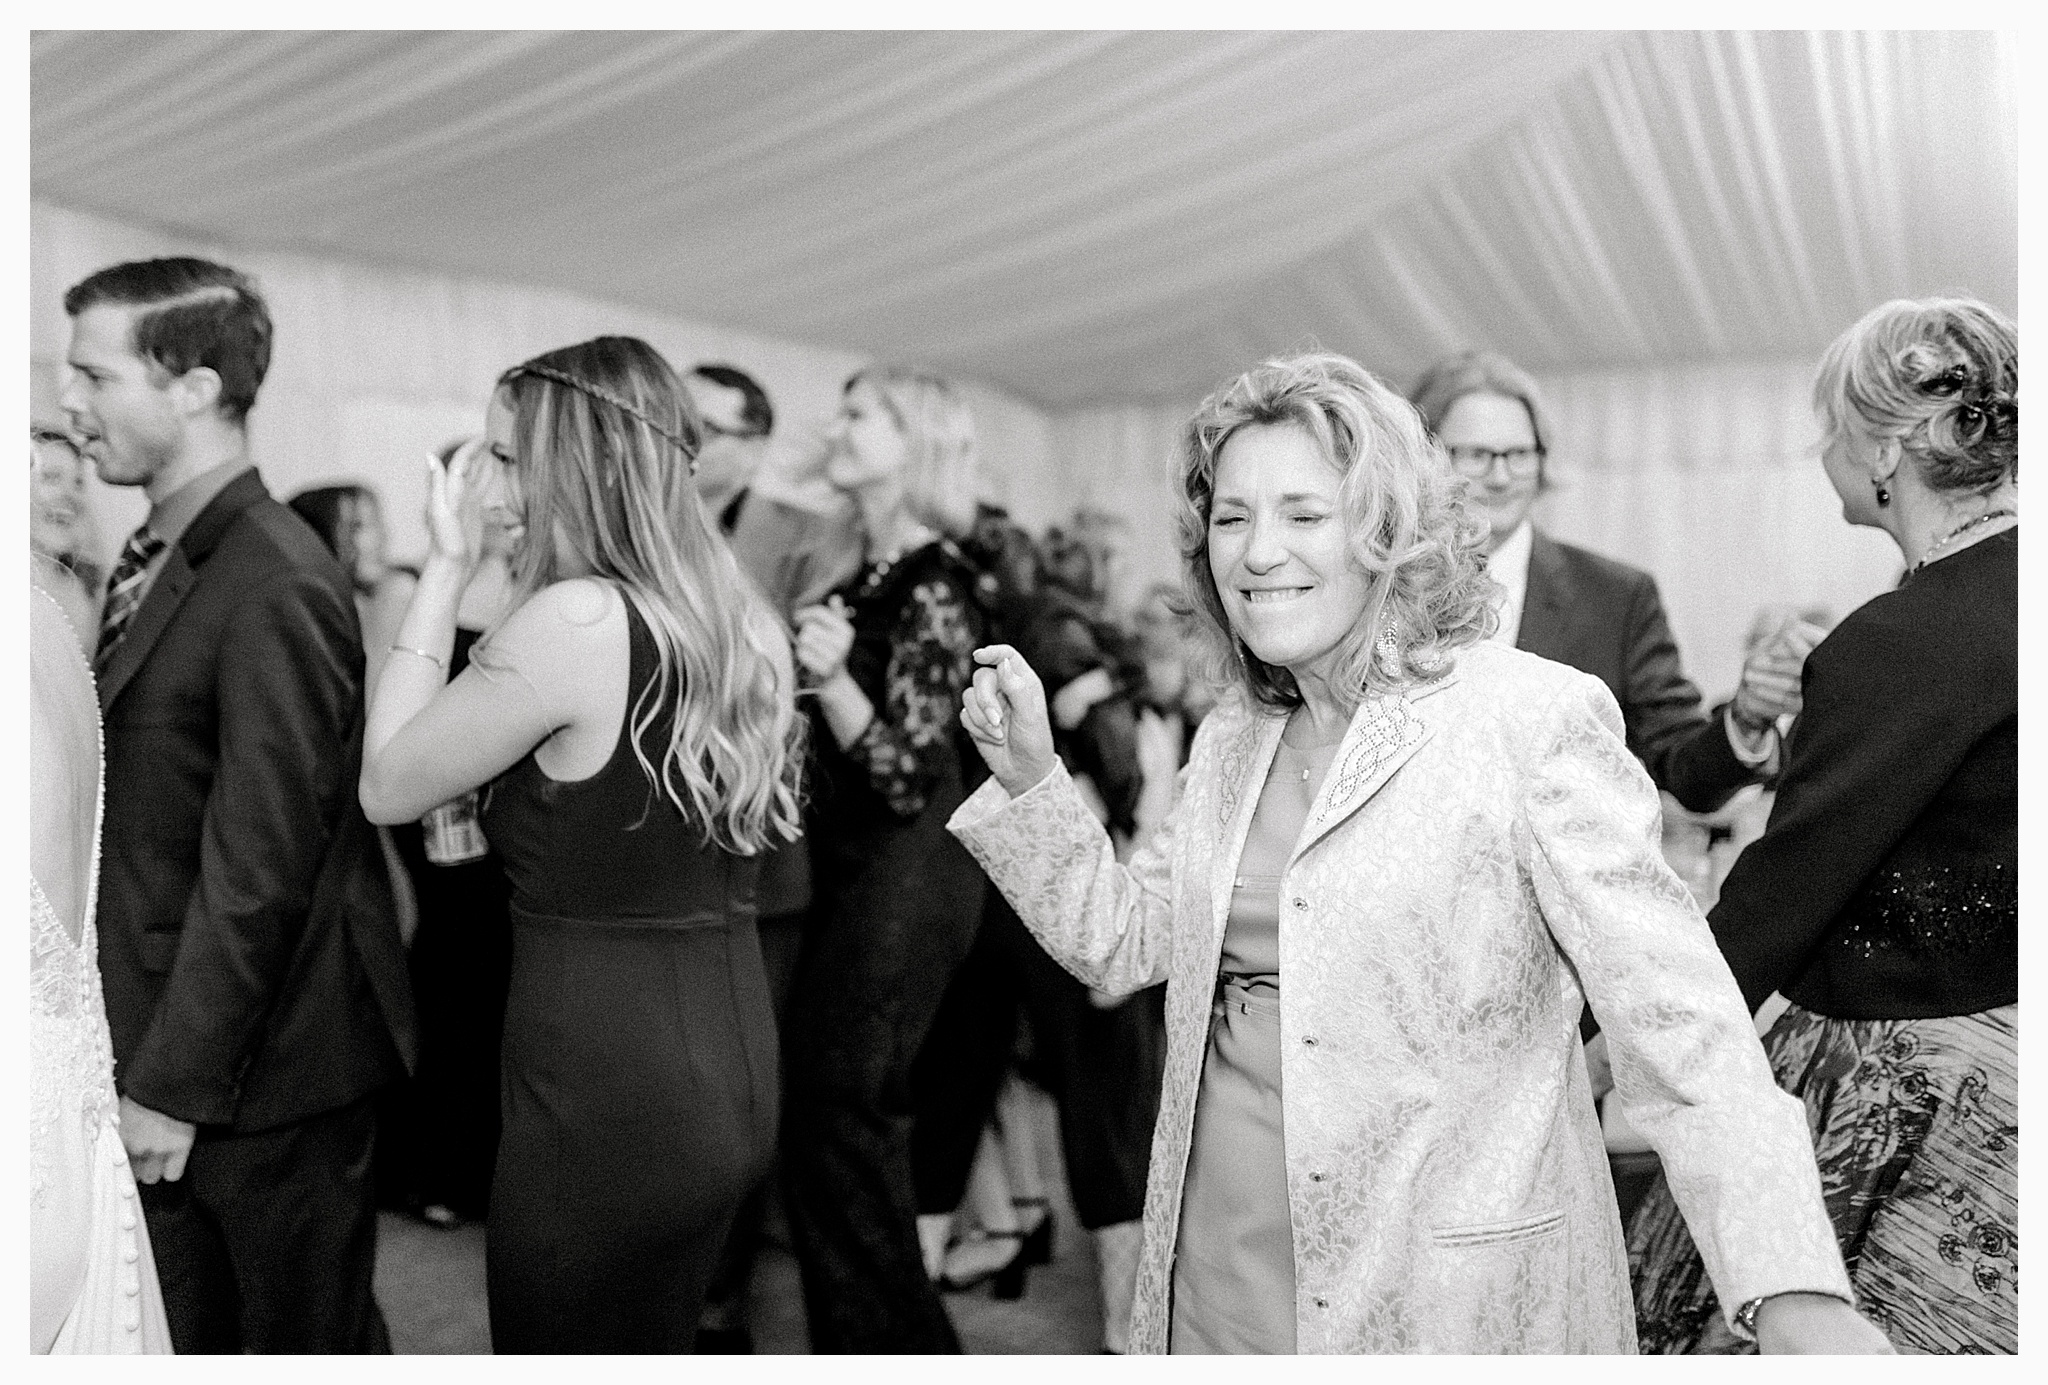 Emma Rose Company Light and Airy Wedding Photographer, Beautiful fall wedding at Rock Creek Gardens Venue in Puyallup, Washington._0113.jpg